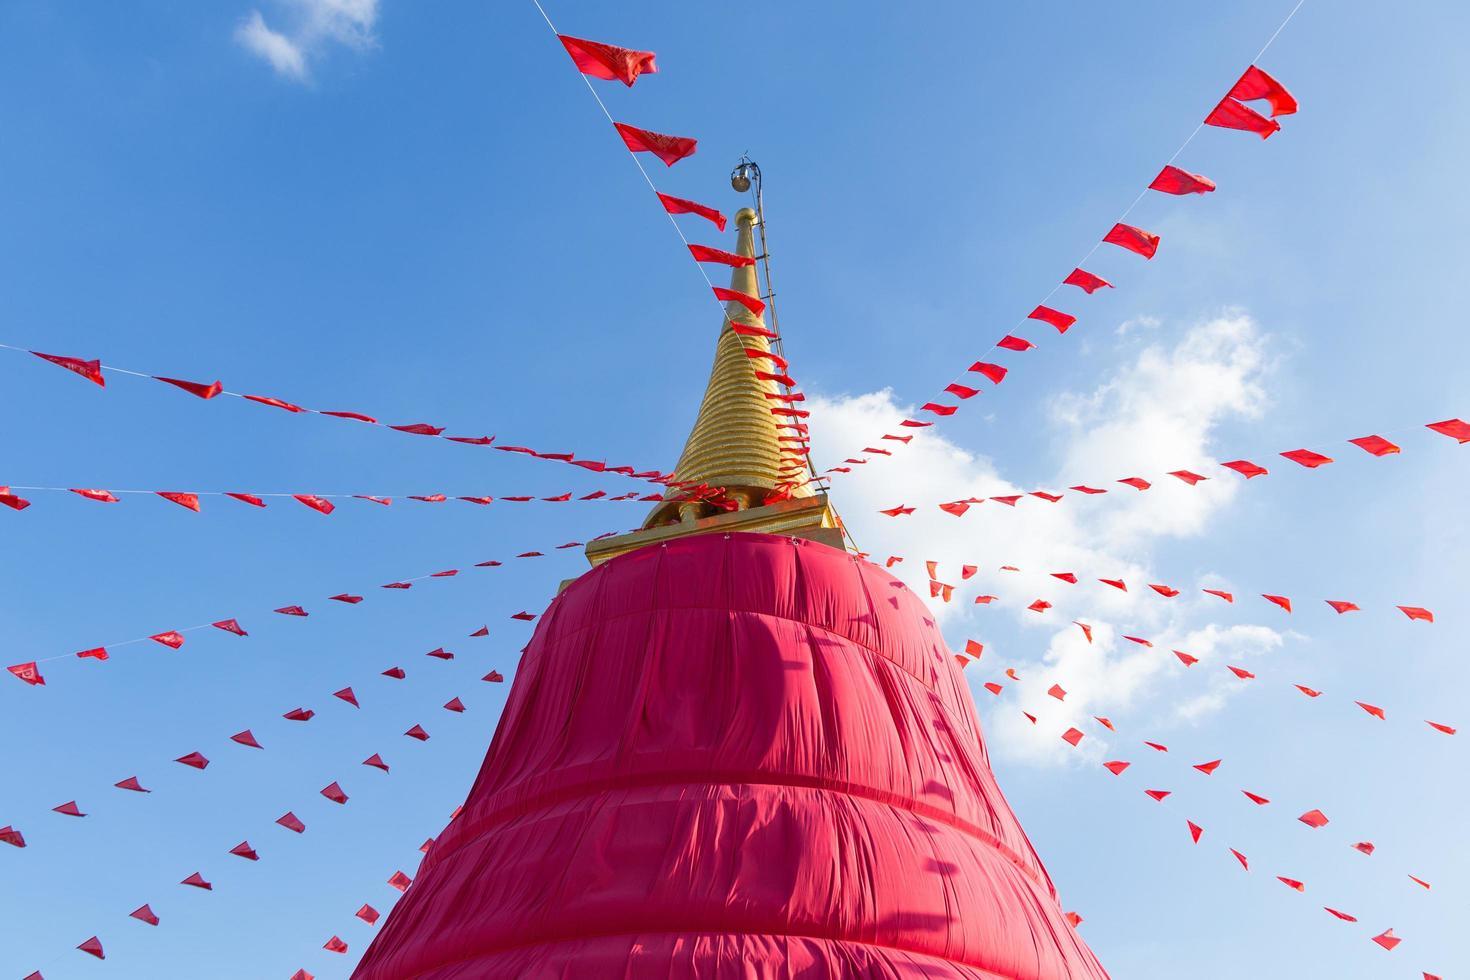 templo de la montaña pagoda en bangkok foto